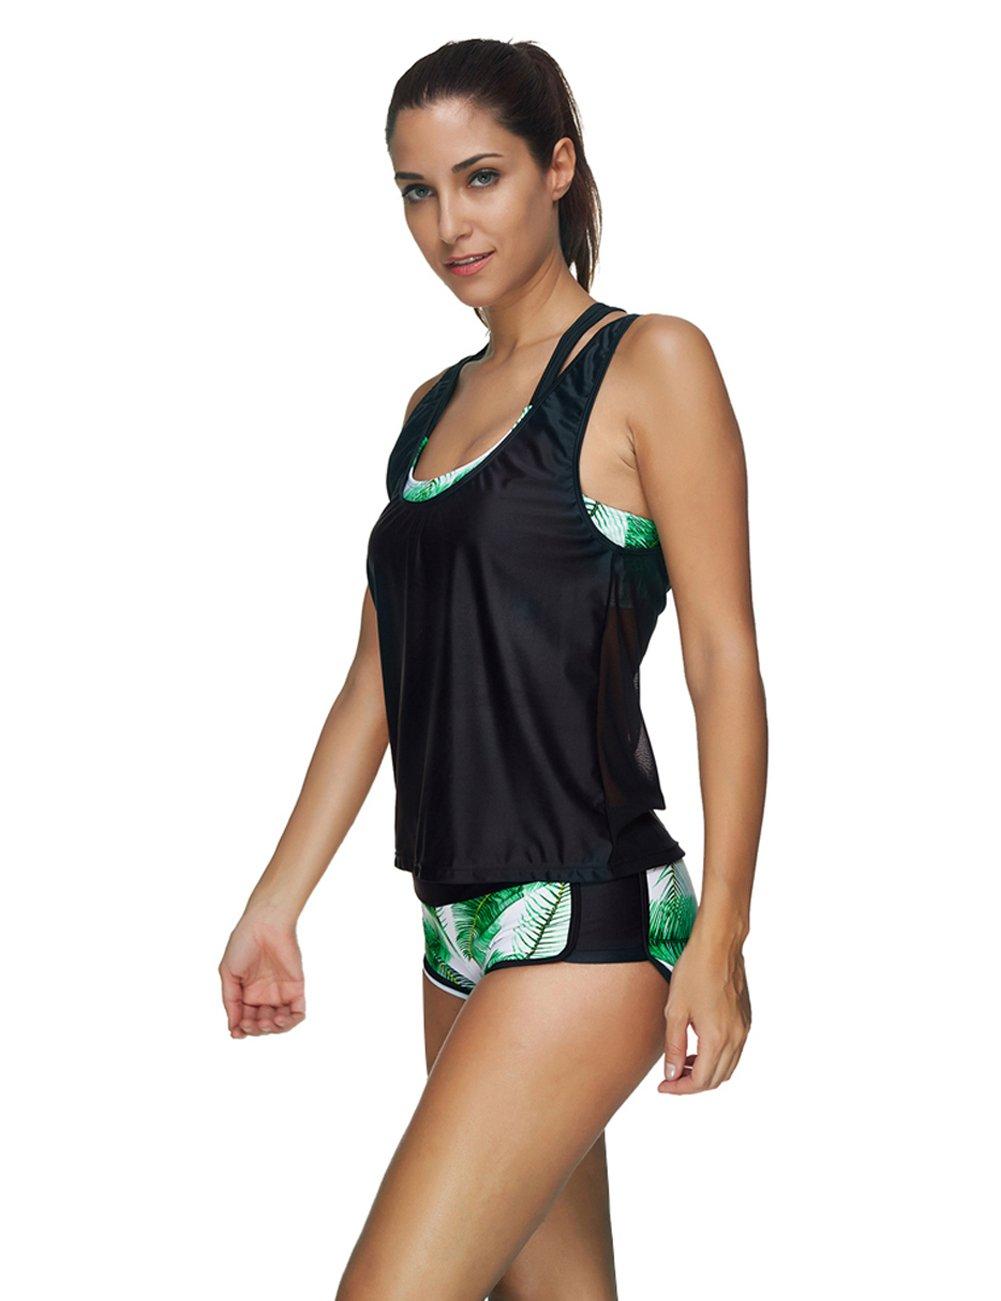 aebf4d1f47780 JOYMODE Womens 3 Pieces Athletic Swimwear Sports Swimsuit Set with Boyshort